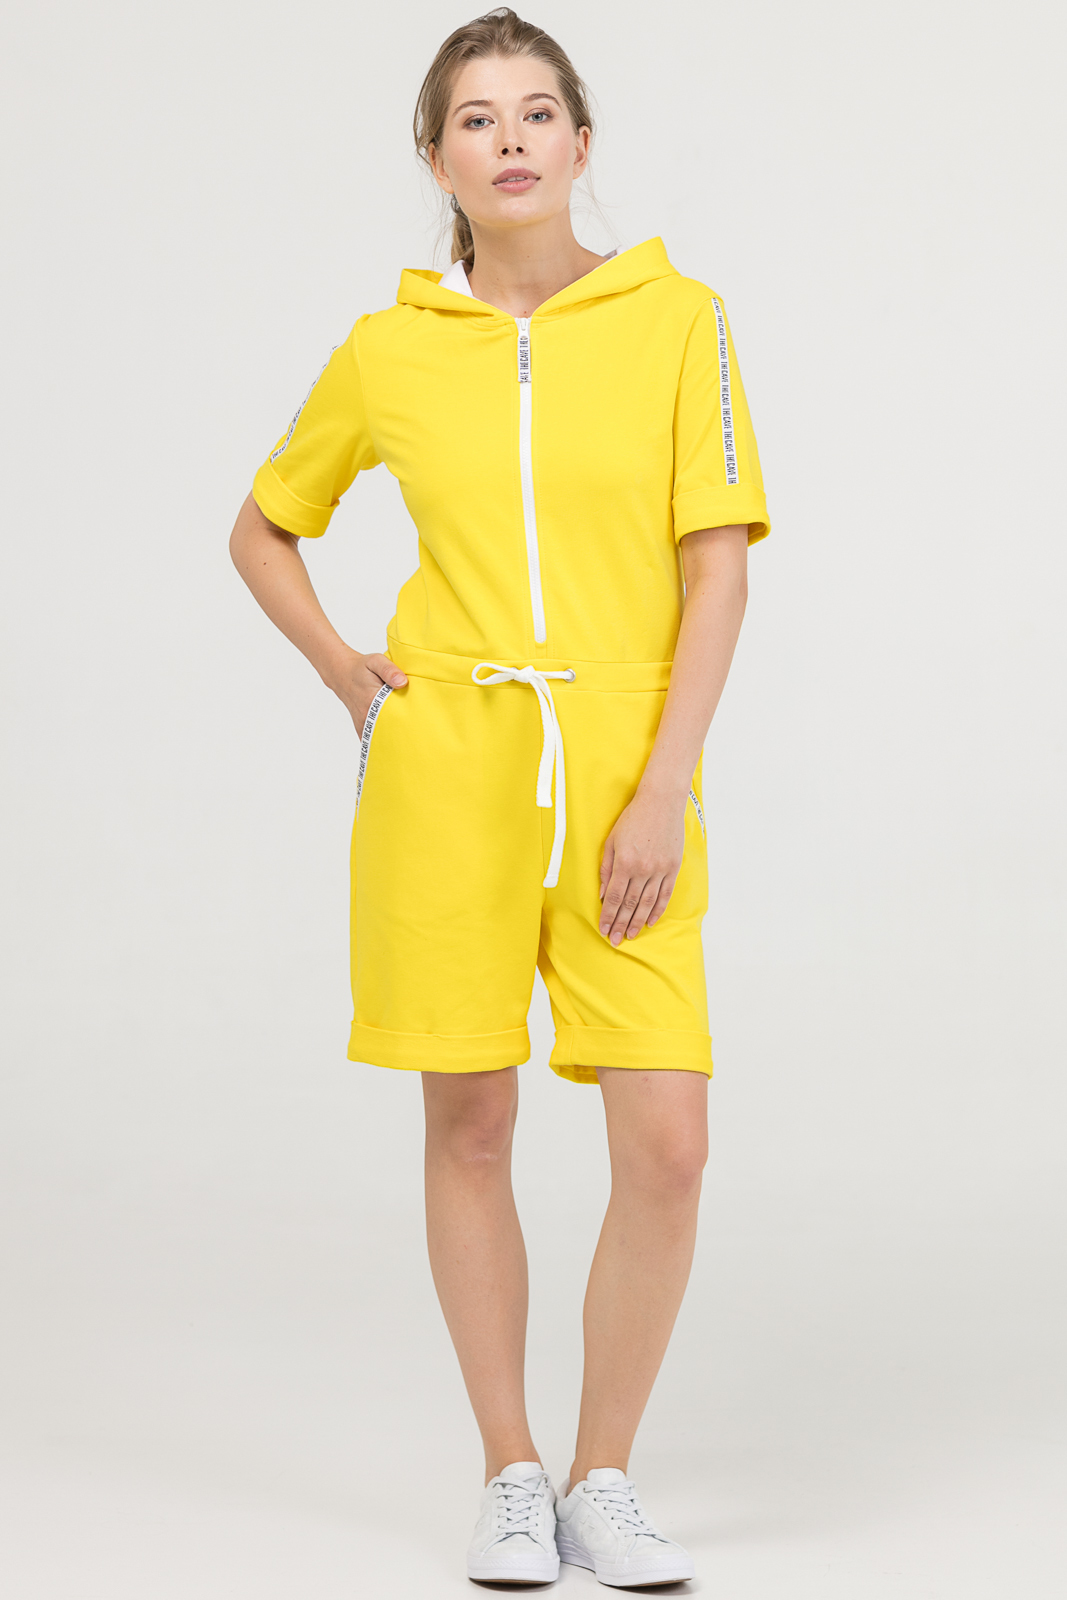 Купить со скидкой Комбинезон Summer желтый женский из текстиля